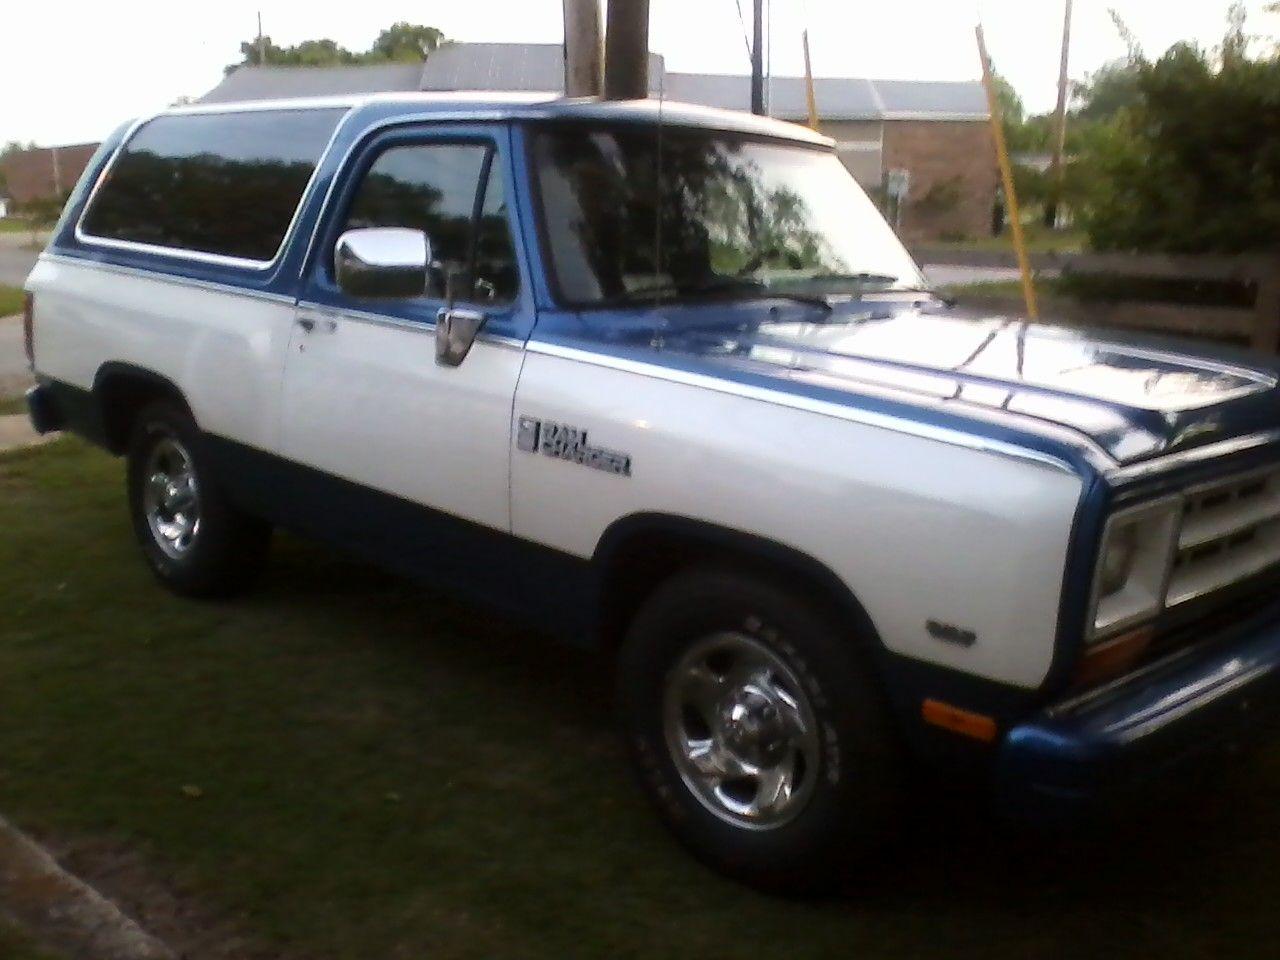 1988 Dodge Ram Charger Completely Restored Old Dodge Trucks Dodge Trucks Dodge Ramcharger